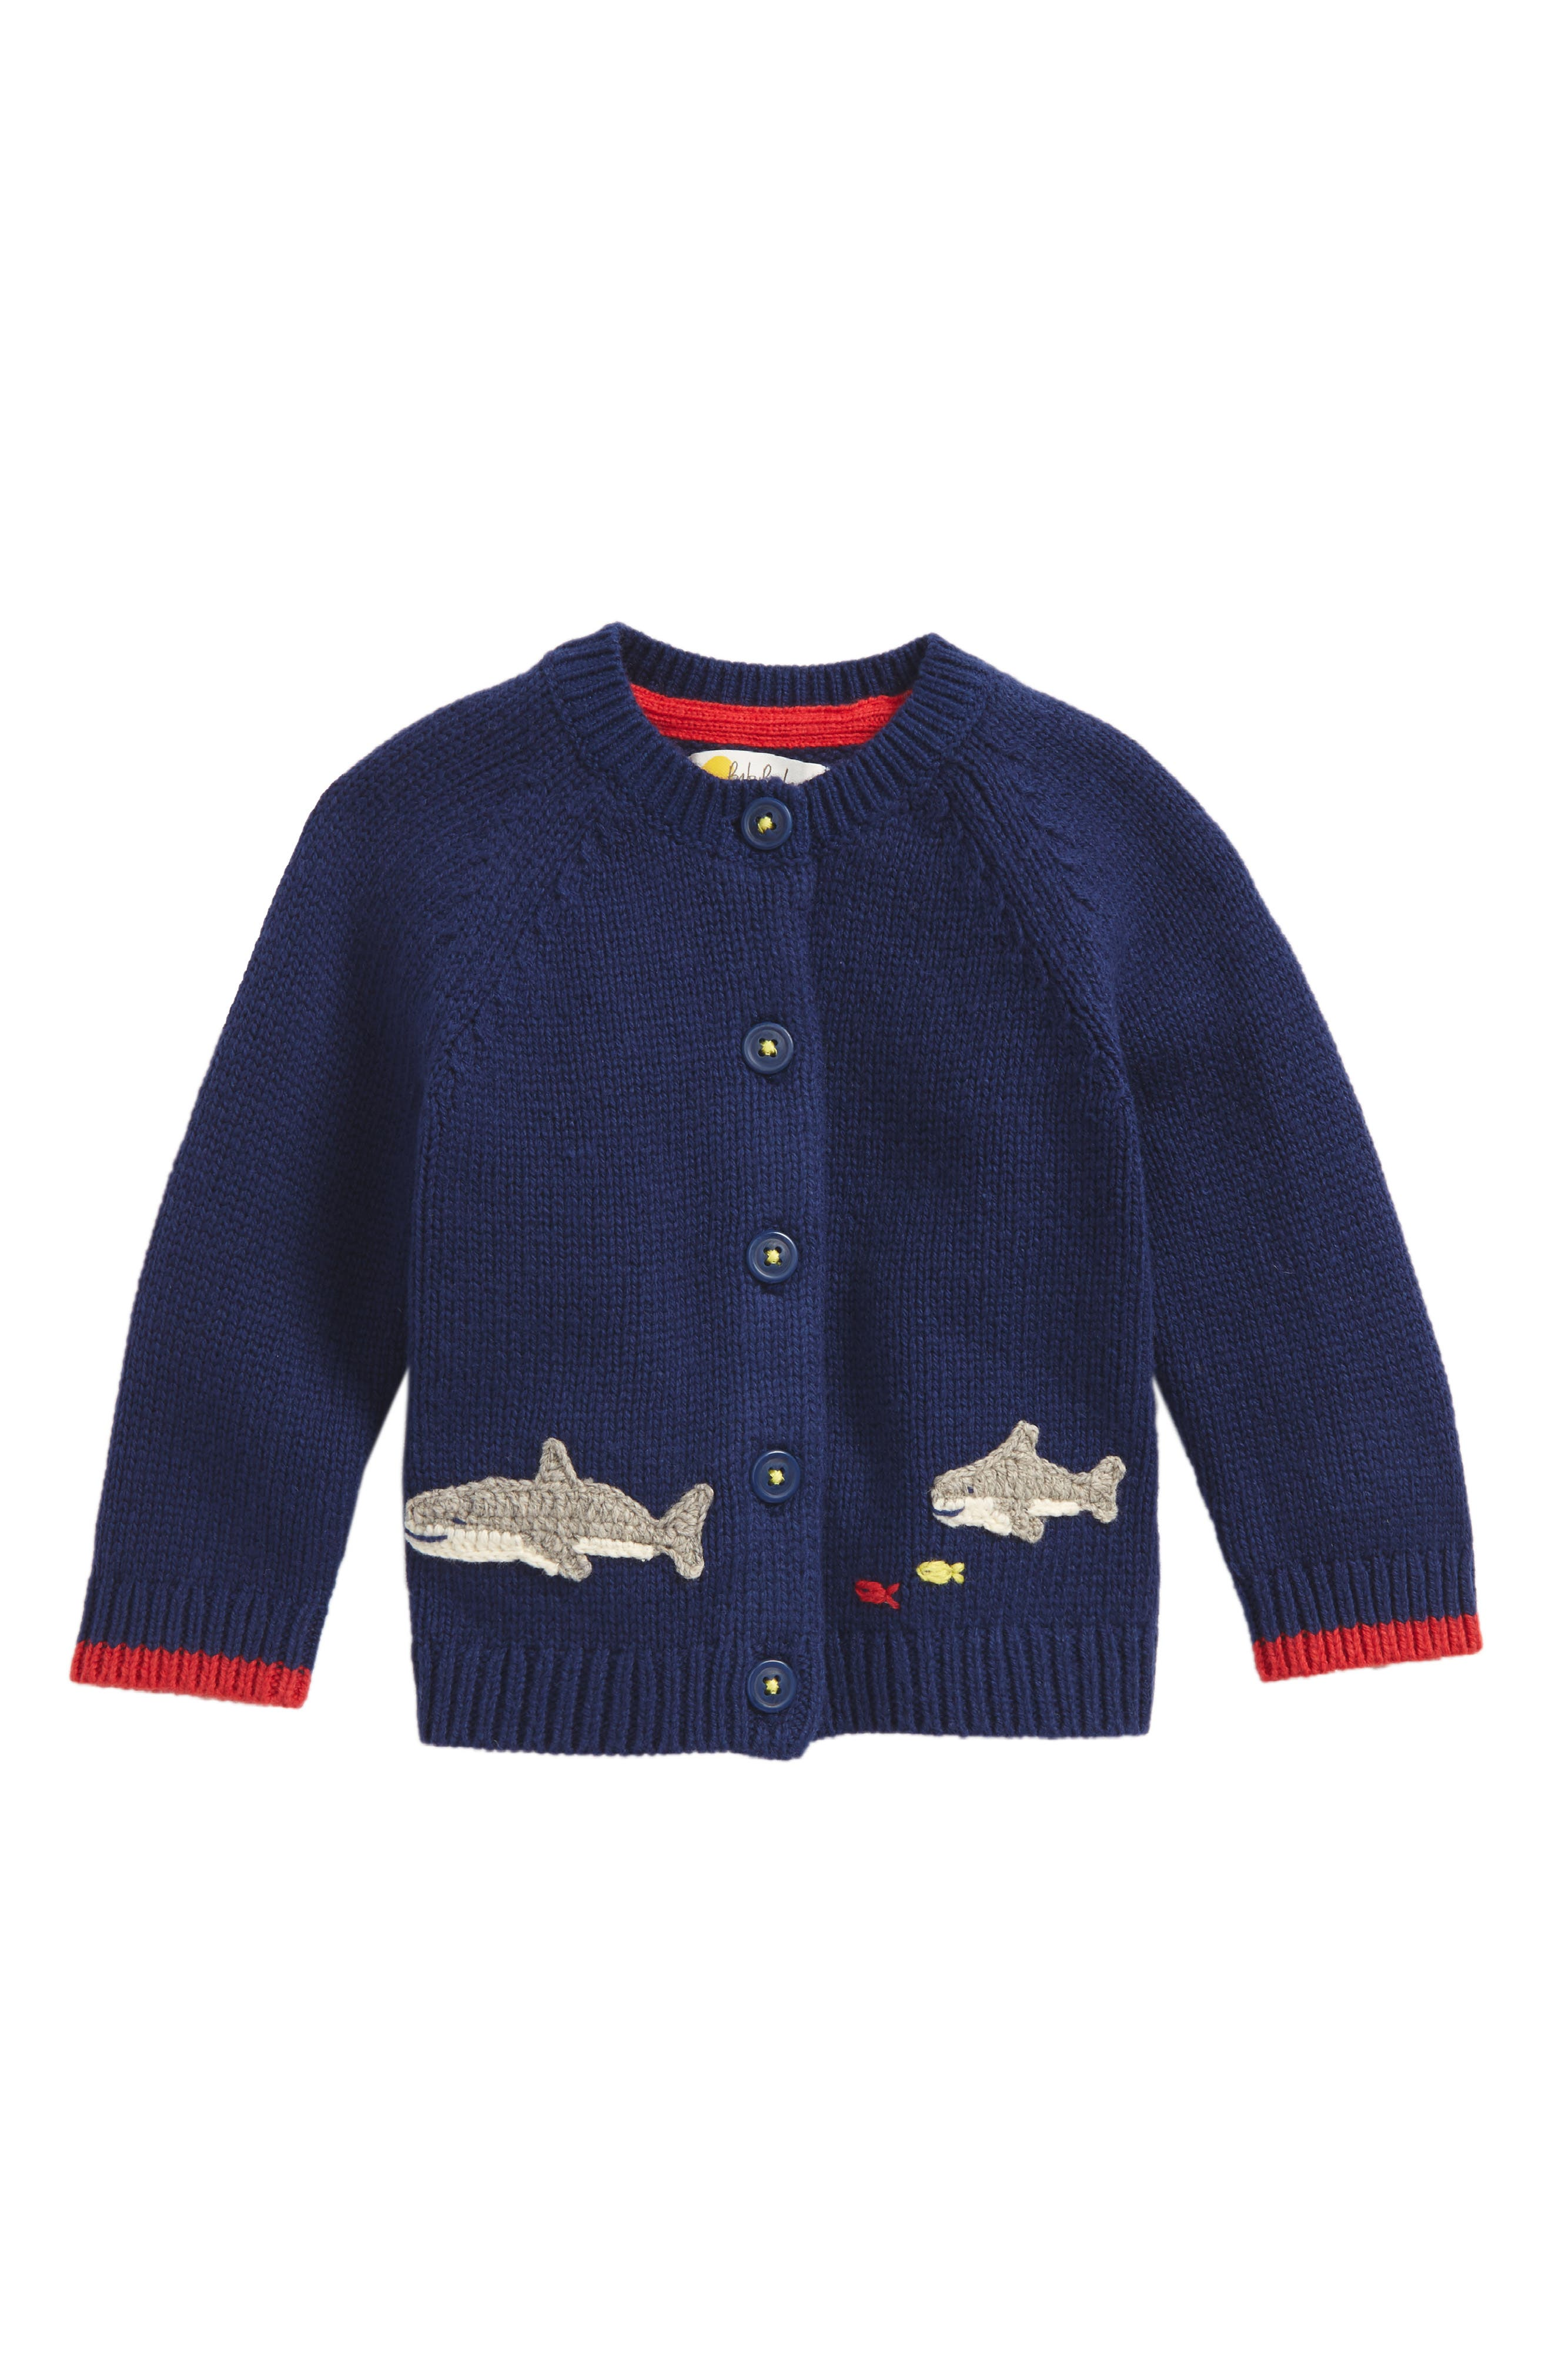 Sea Creature Sweater Cardigan,                         Main,                         color, Beacon Blue Sharks